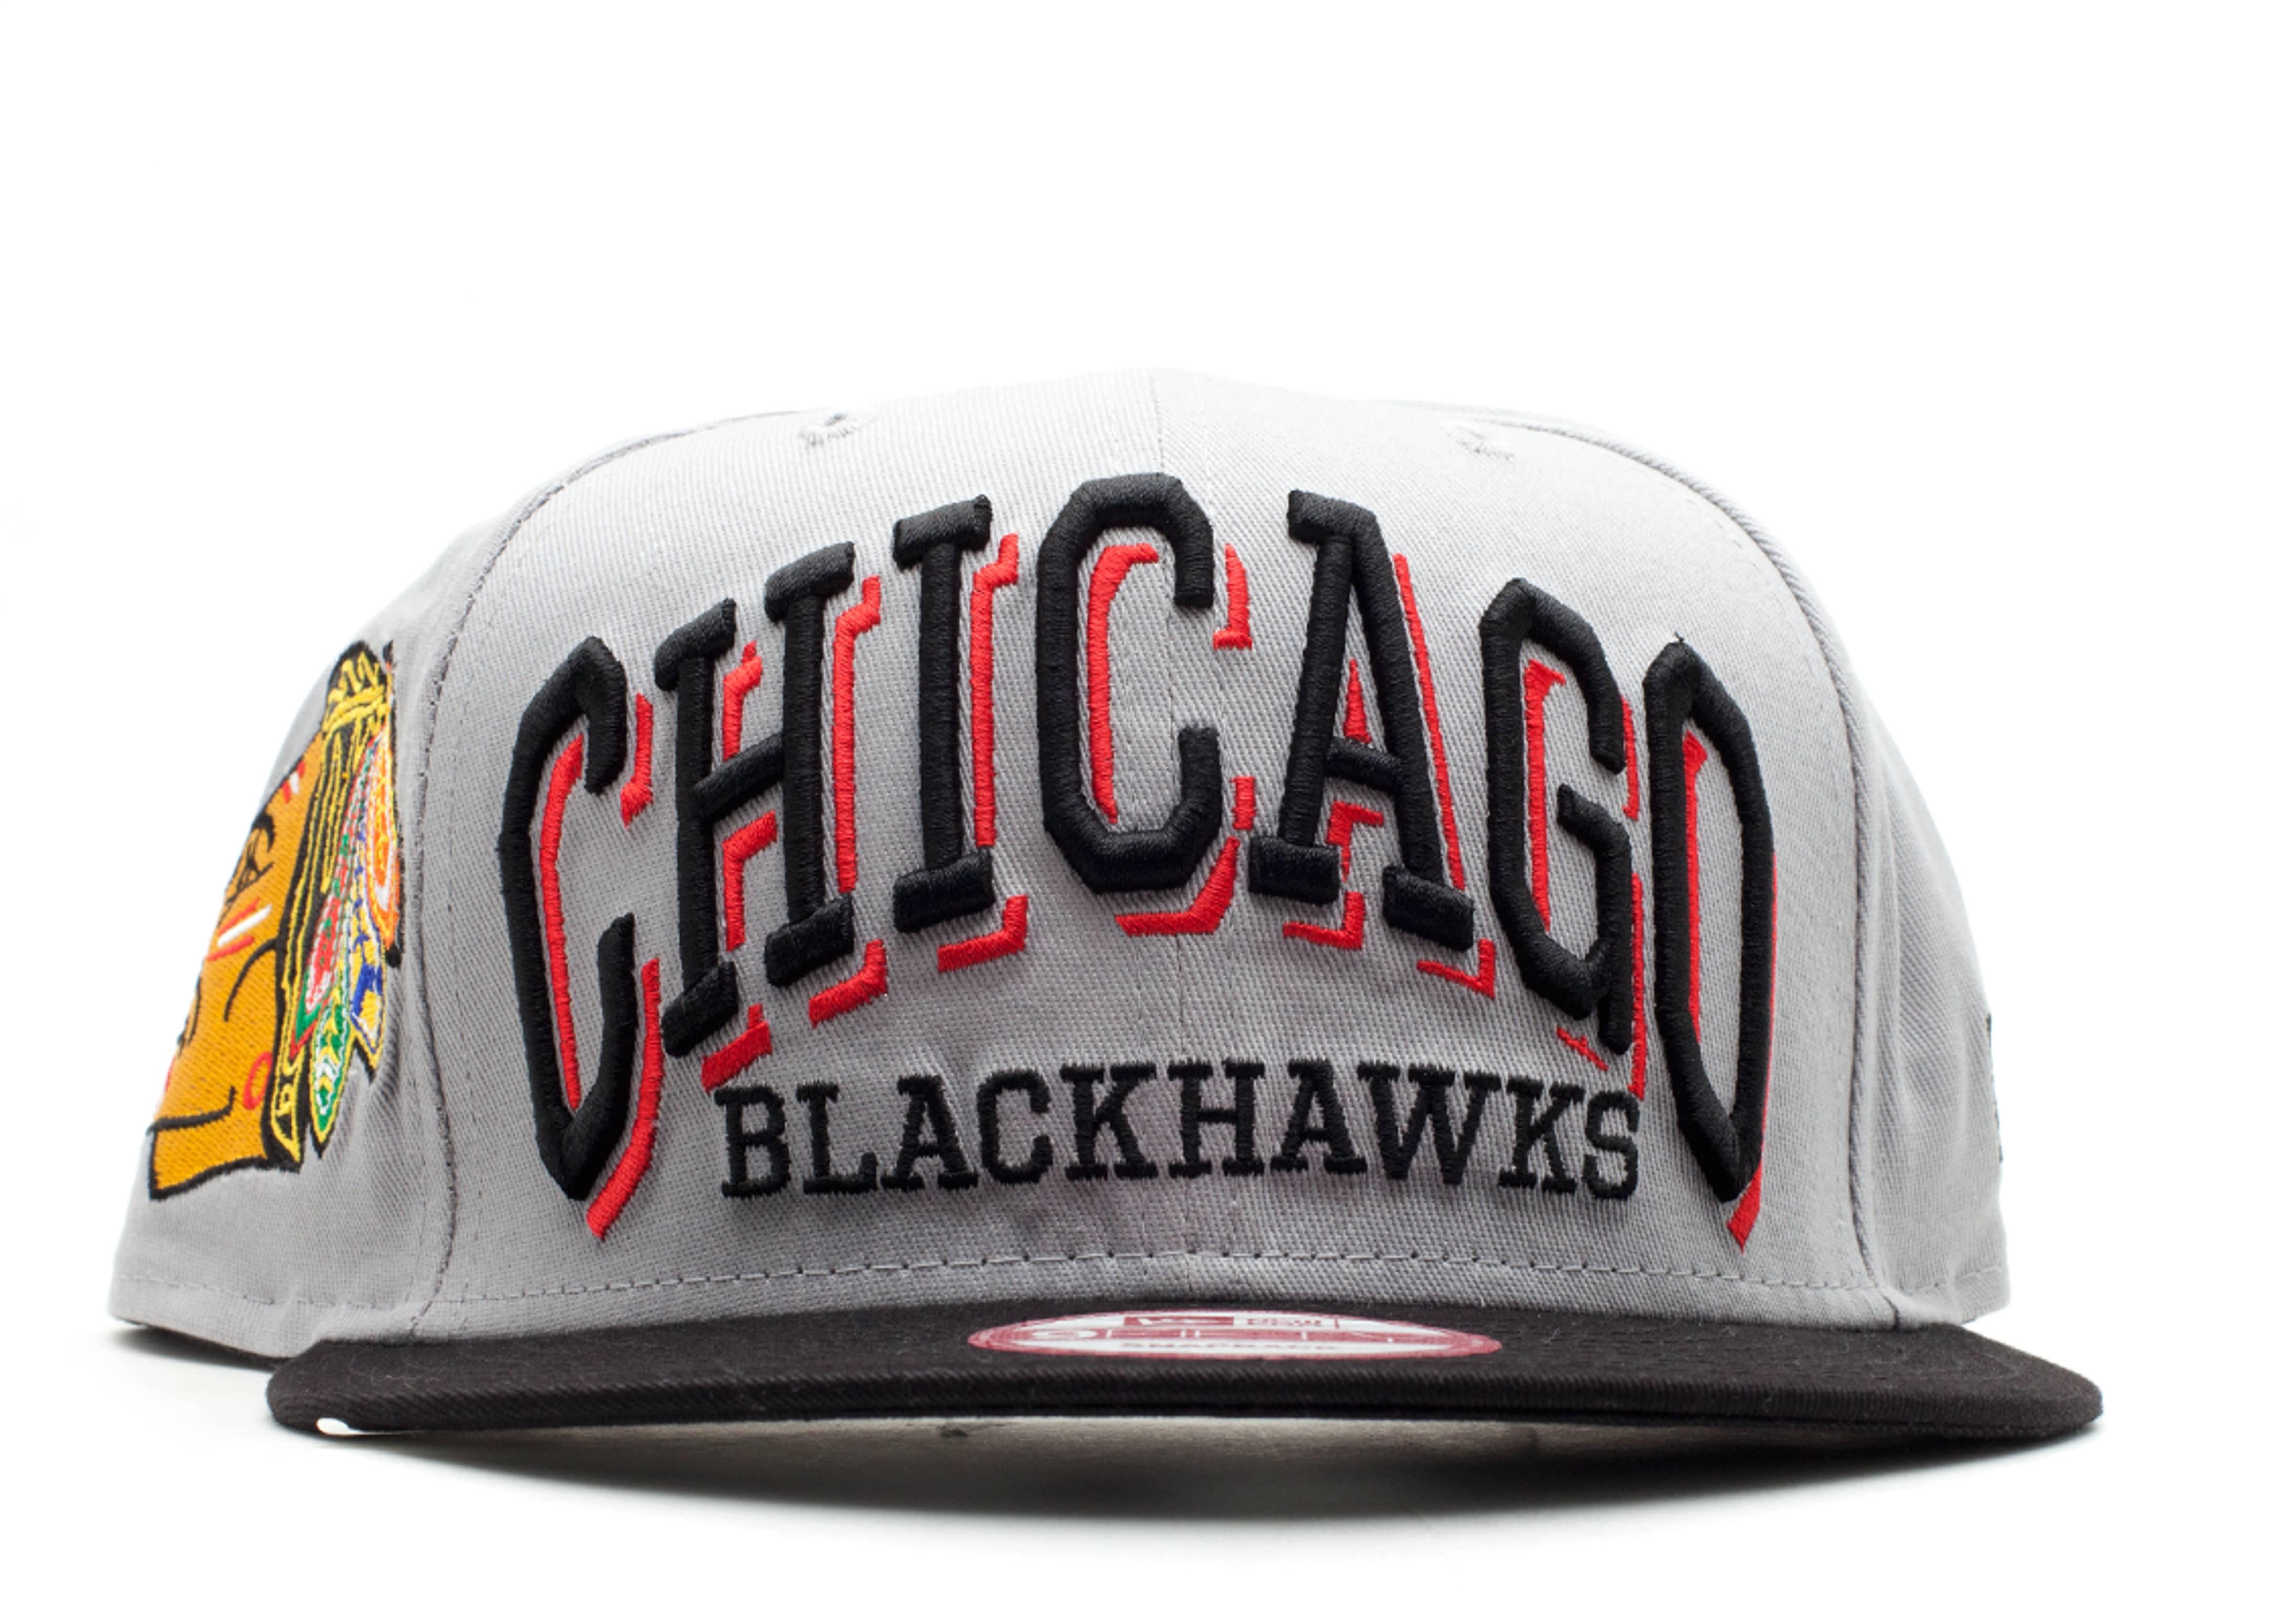 chicago blackhawks snap-back